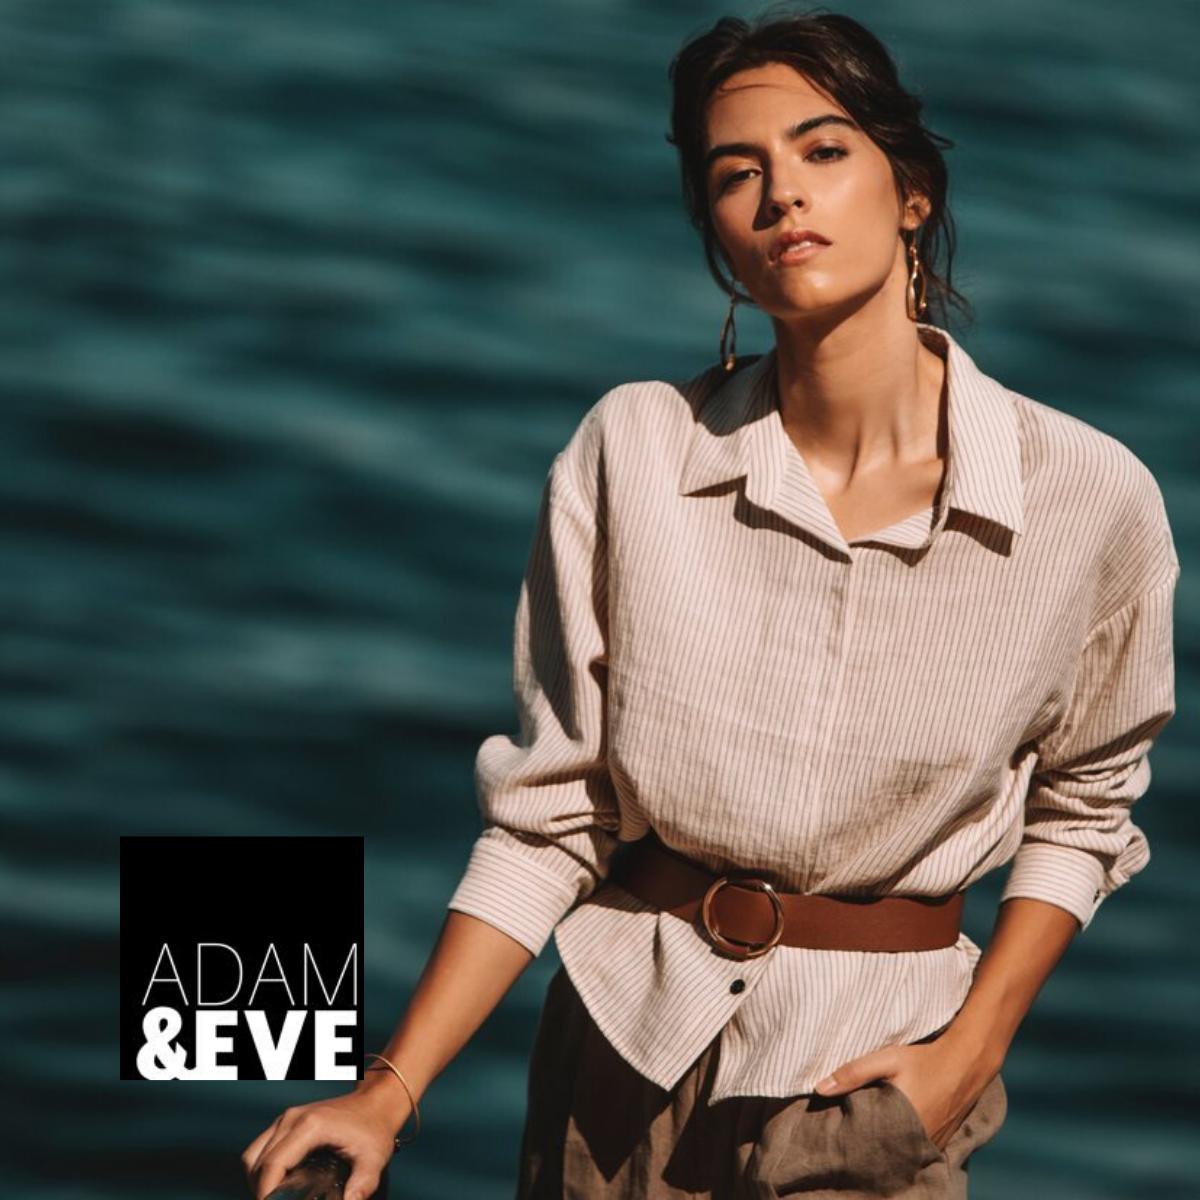 Adam & Ève on Shopify